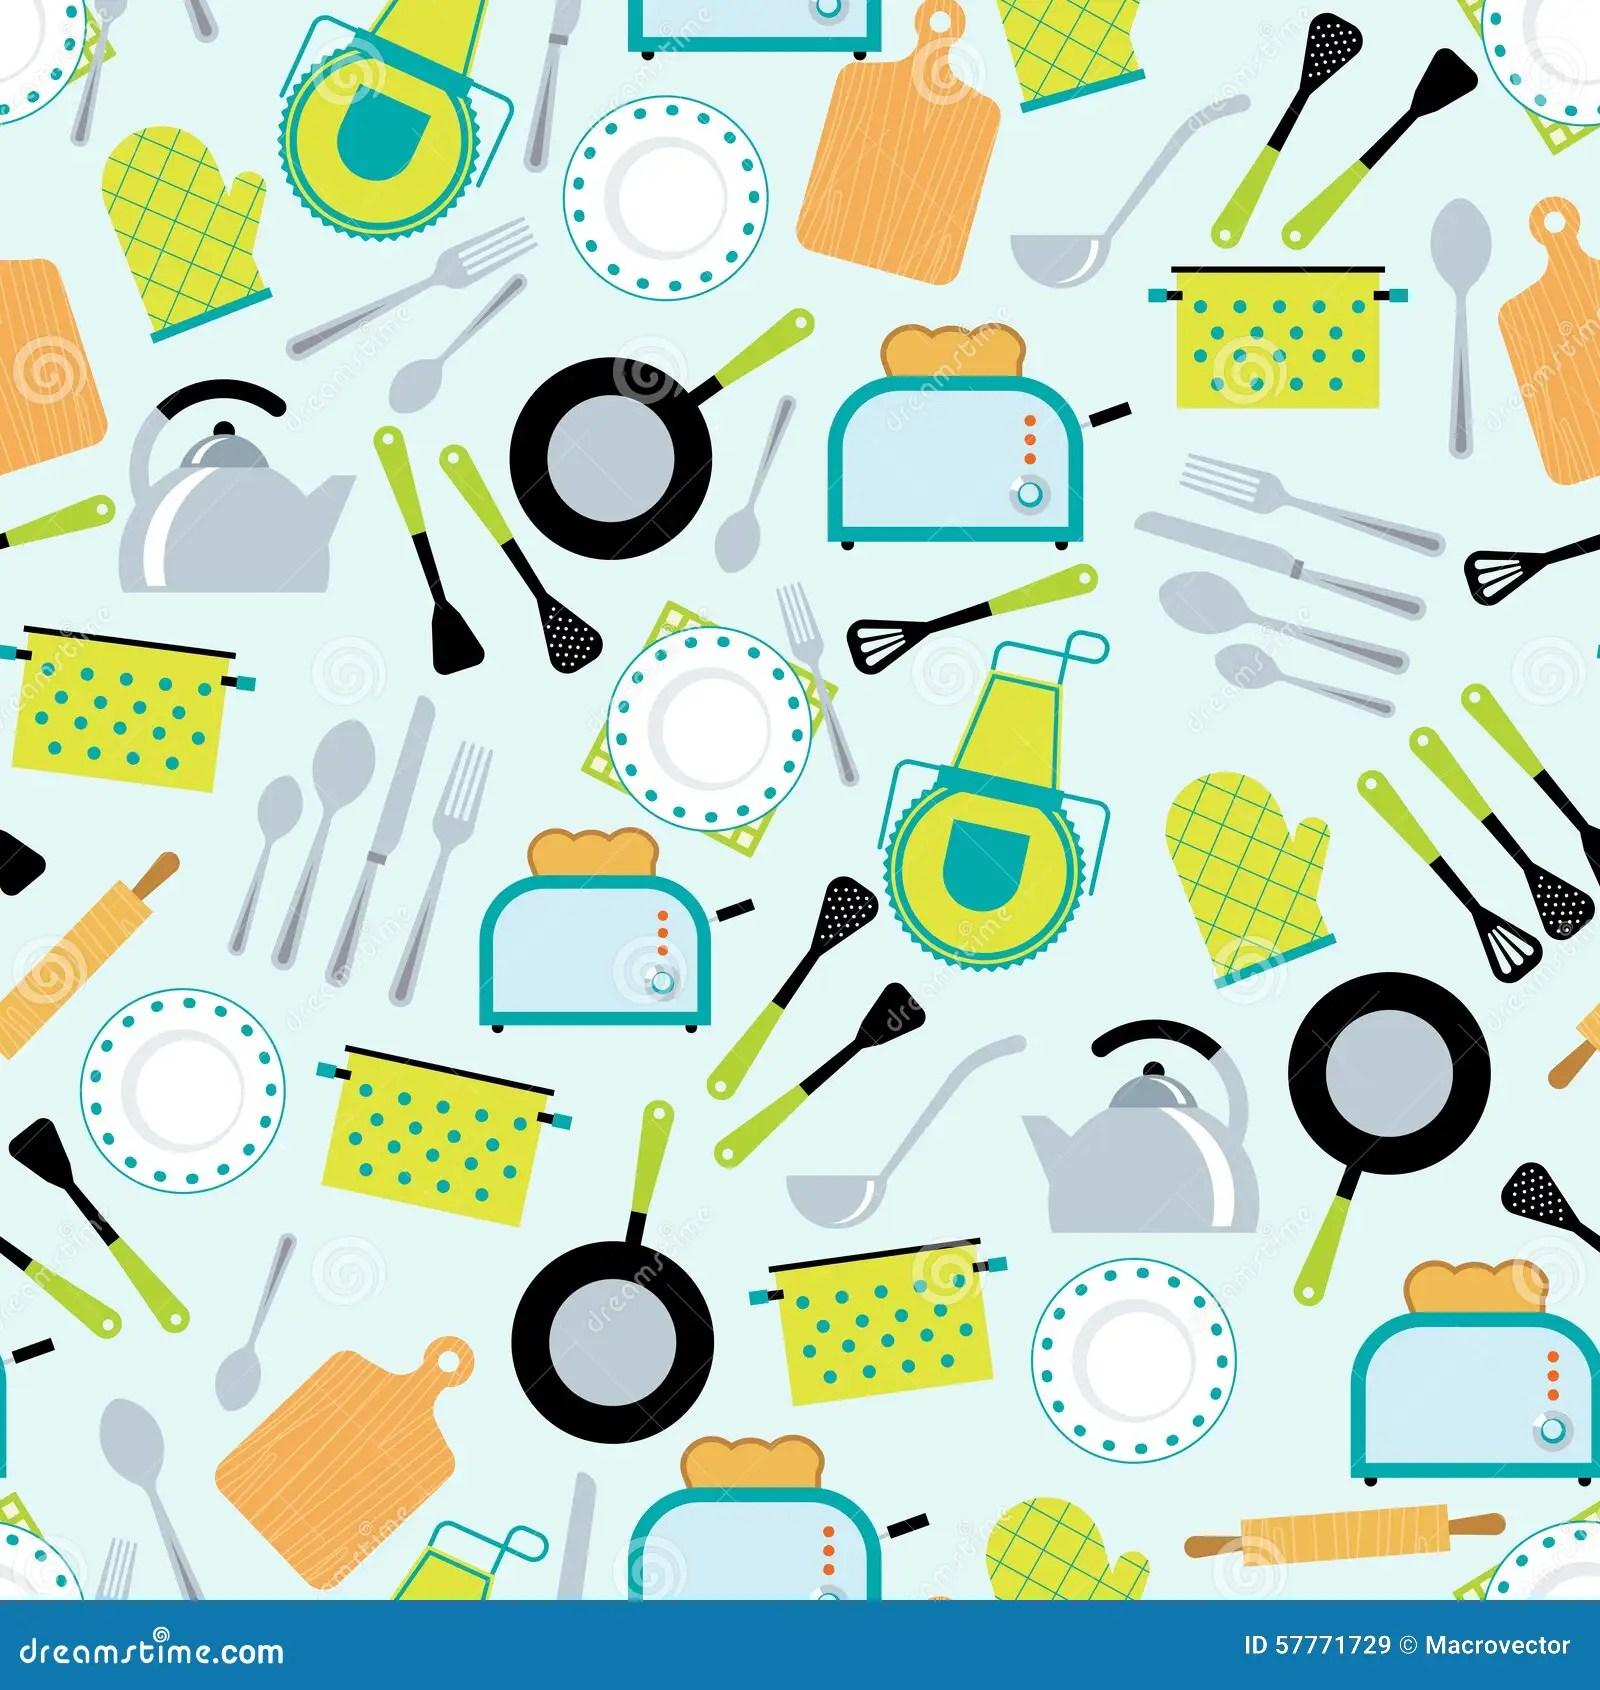 kitchen aid ovens how to make cabinet doors 烹调辅助部件无缝的样式向量例证 插画包括有烹调 杓子 厨房 刀叉餐具 家庭烹饪厨房辅助部件用工具加工齿轮和器物装饰无缝的套纸tileable样式摘要传染媒介例证